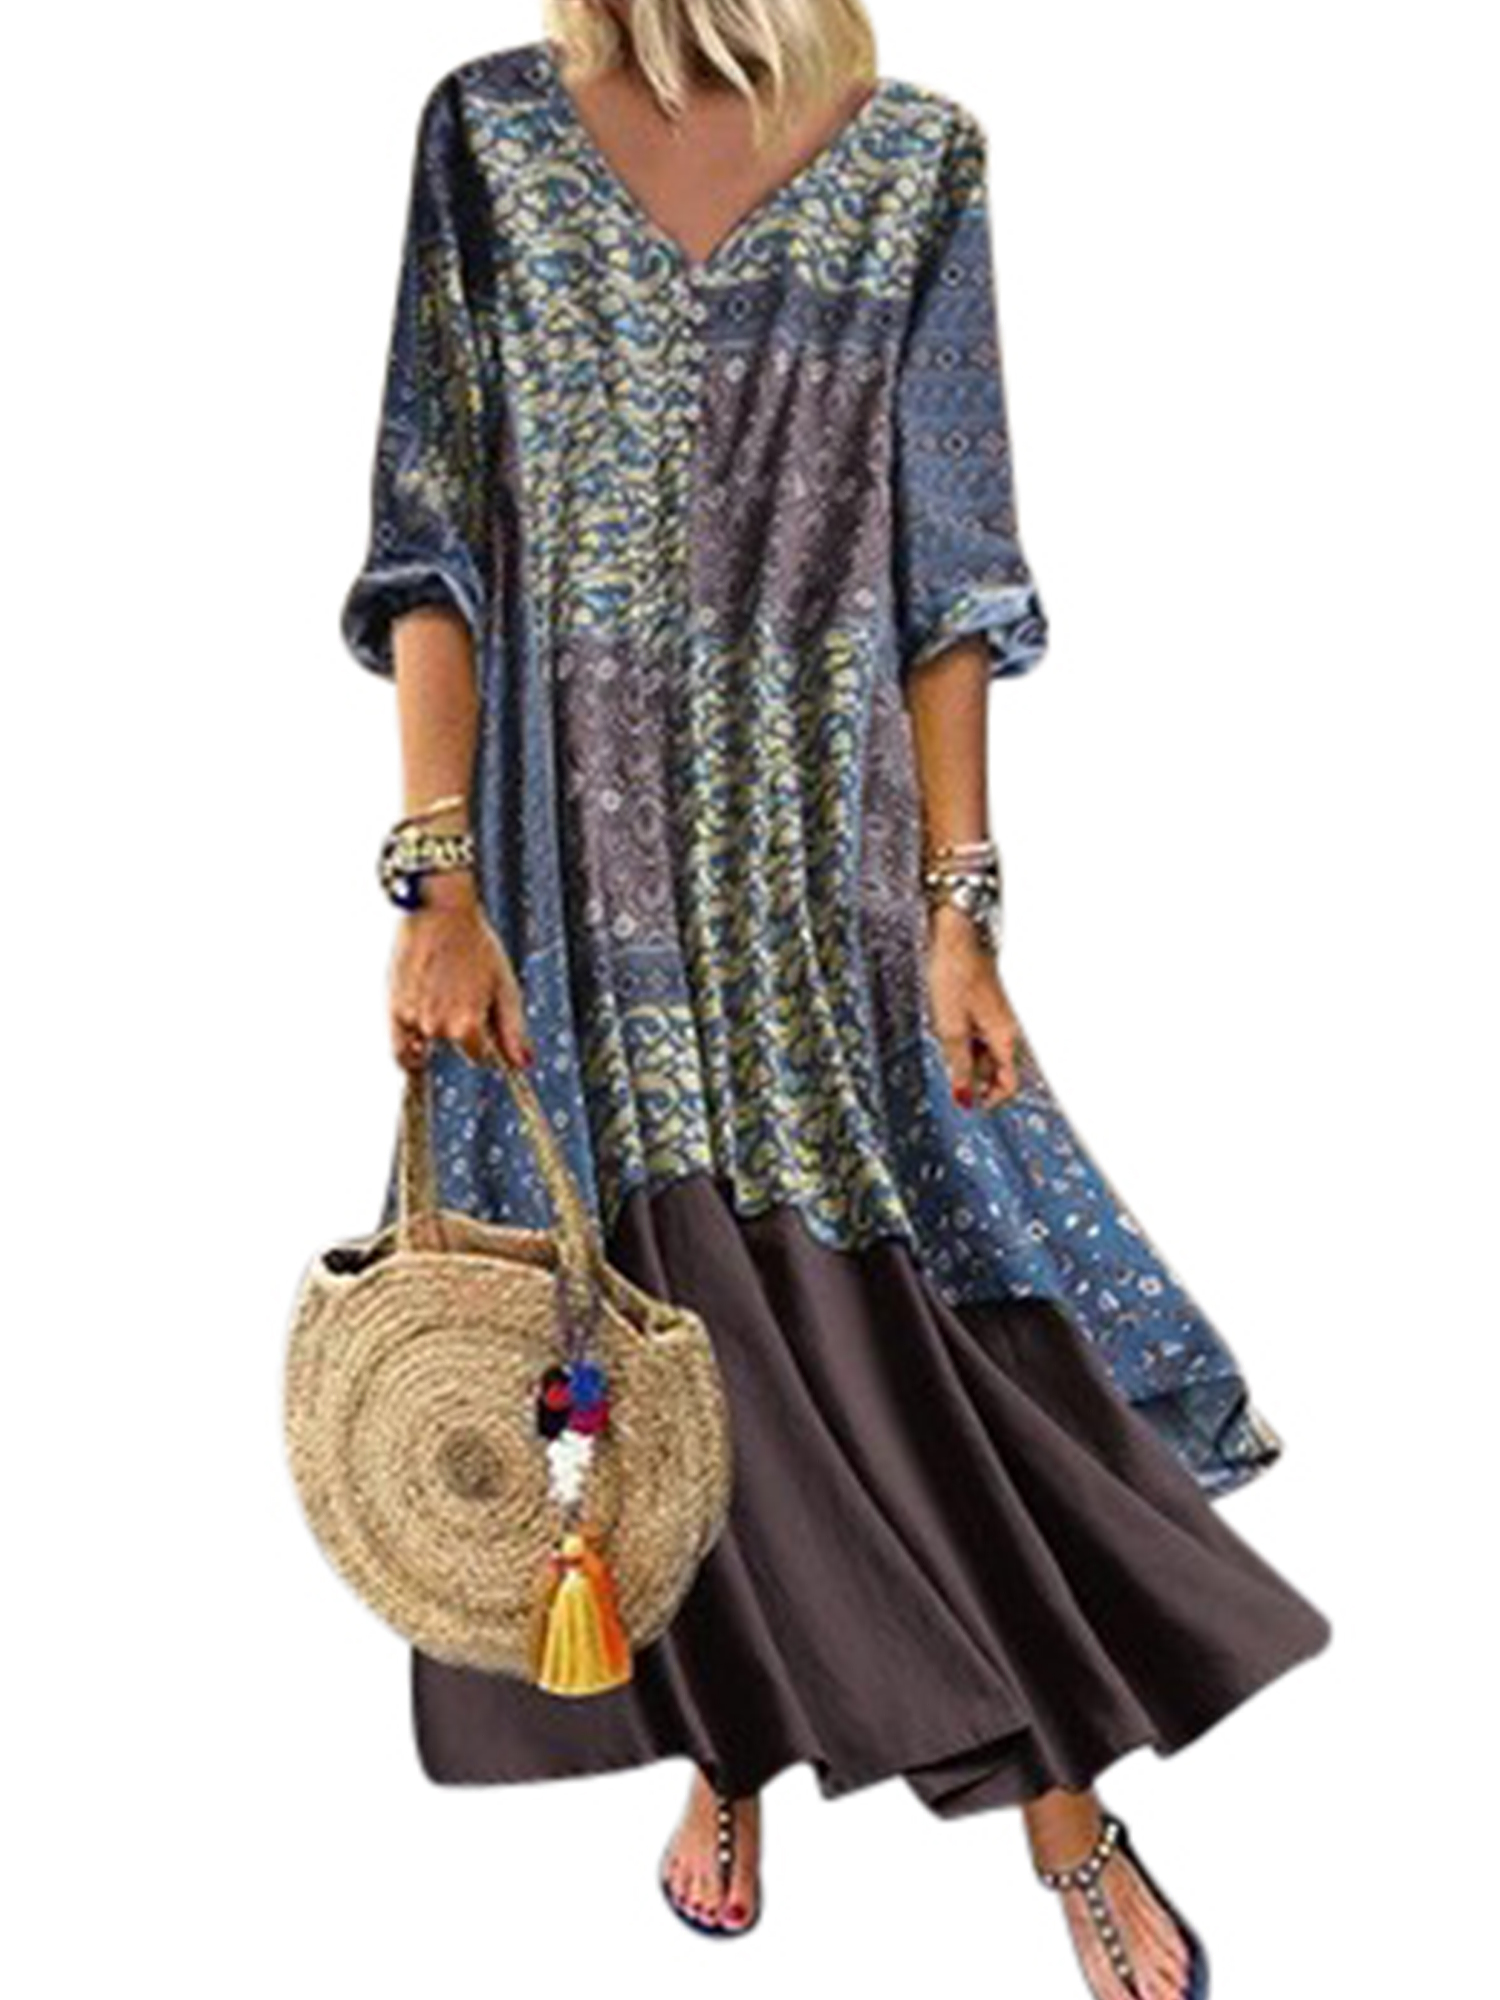 Maxi Dress Linen Long Boho Cotton Womens Casual Kaftan Tunic Gypsy Sleeve Dress